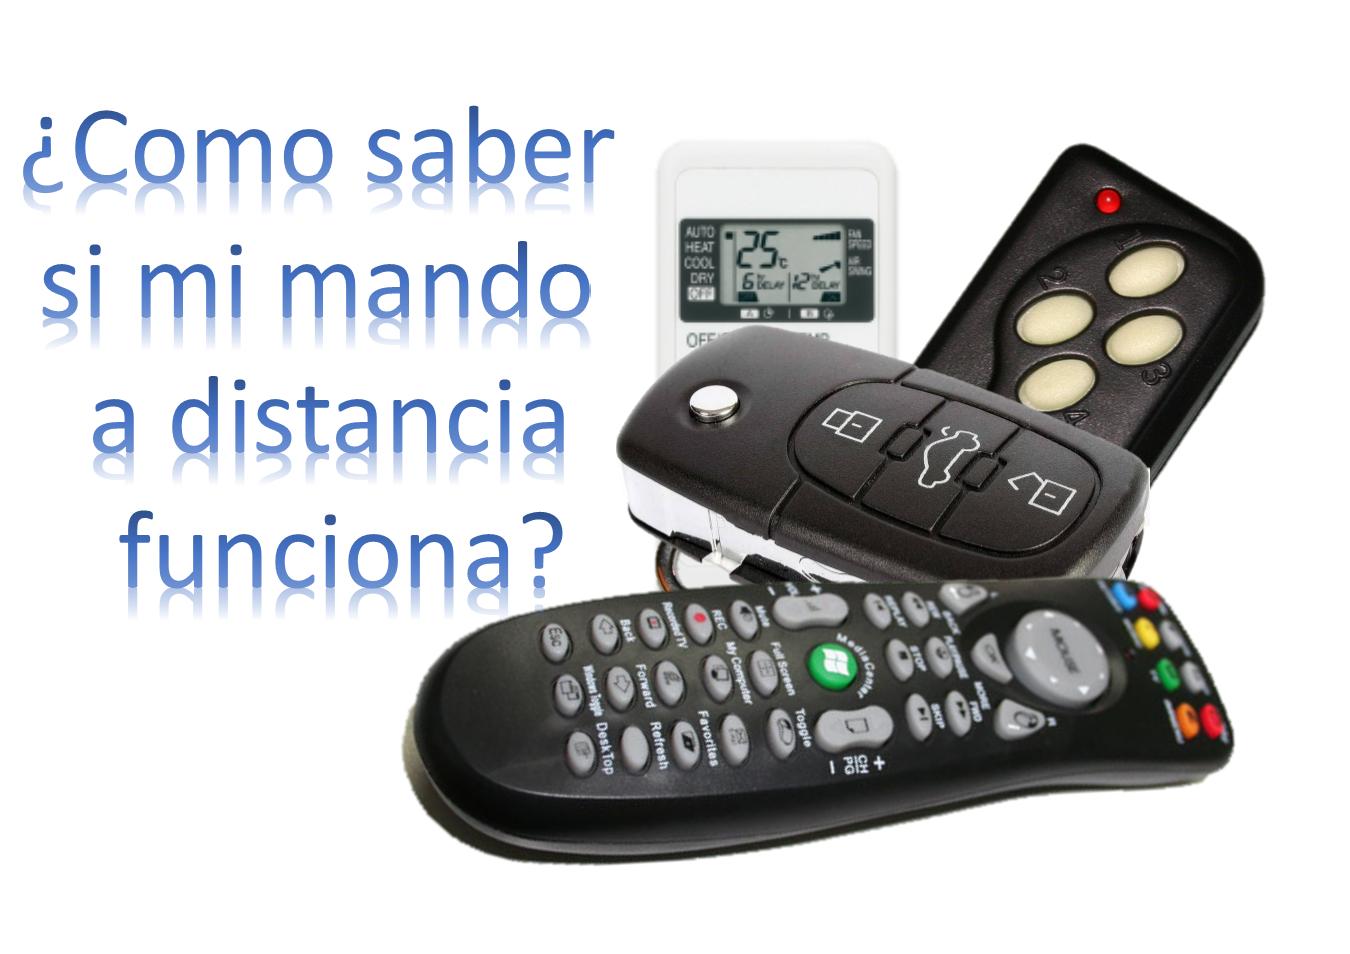 Truco para saber si el mando a distancia funciona.